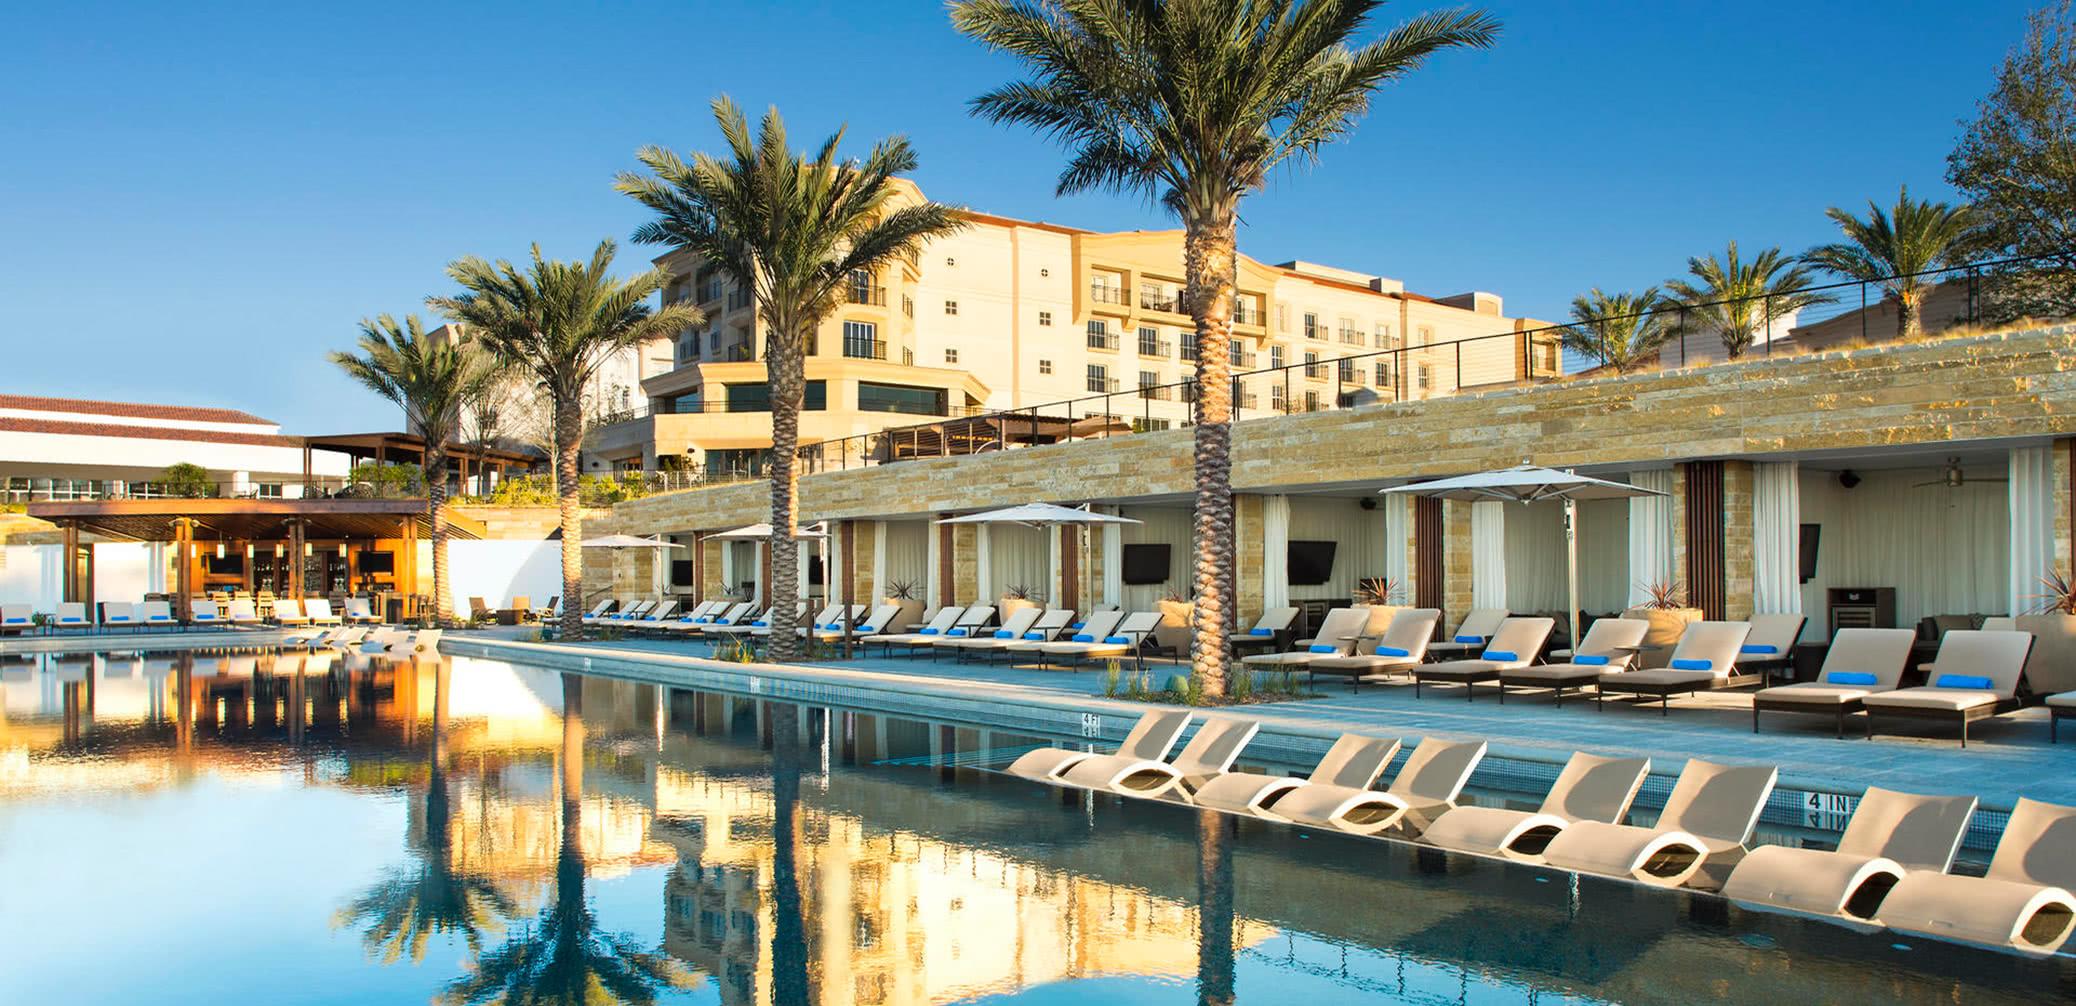 Best Hotel Executive Club Lounges In San Antonio, Texas